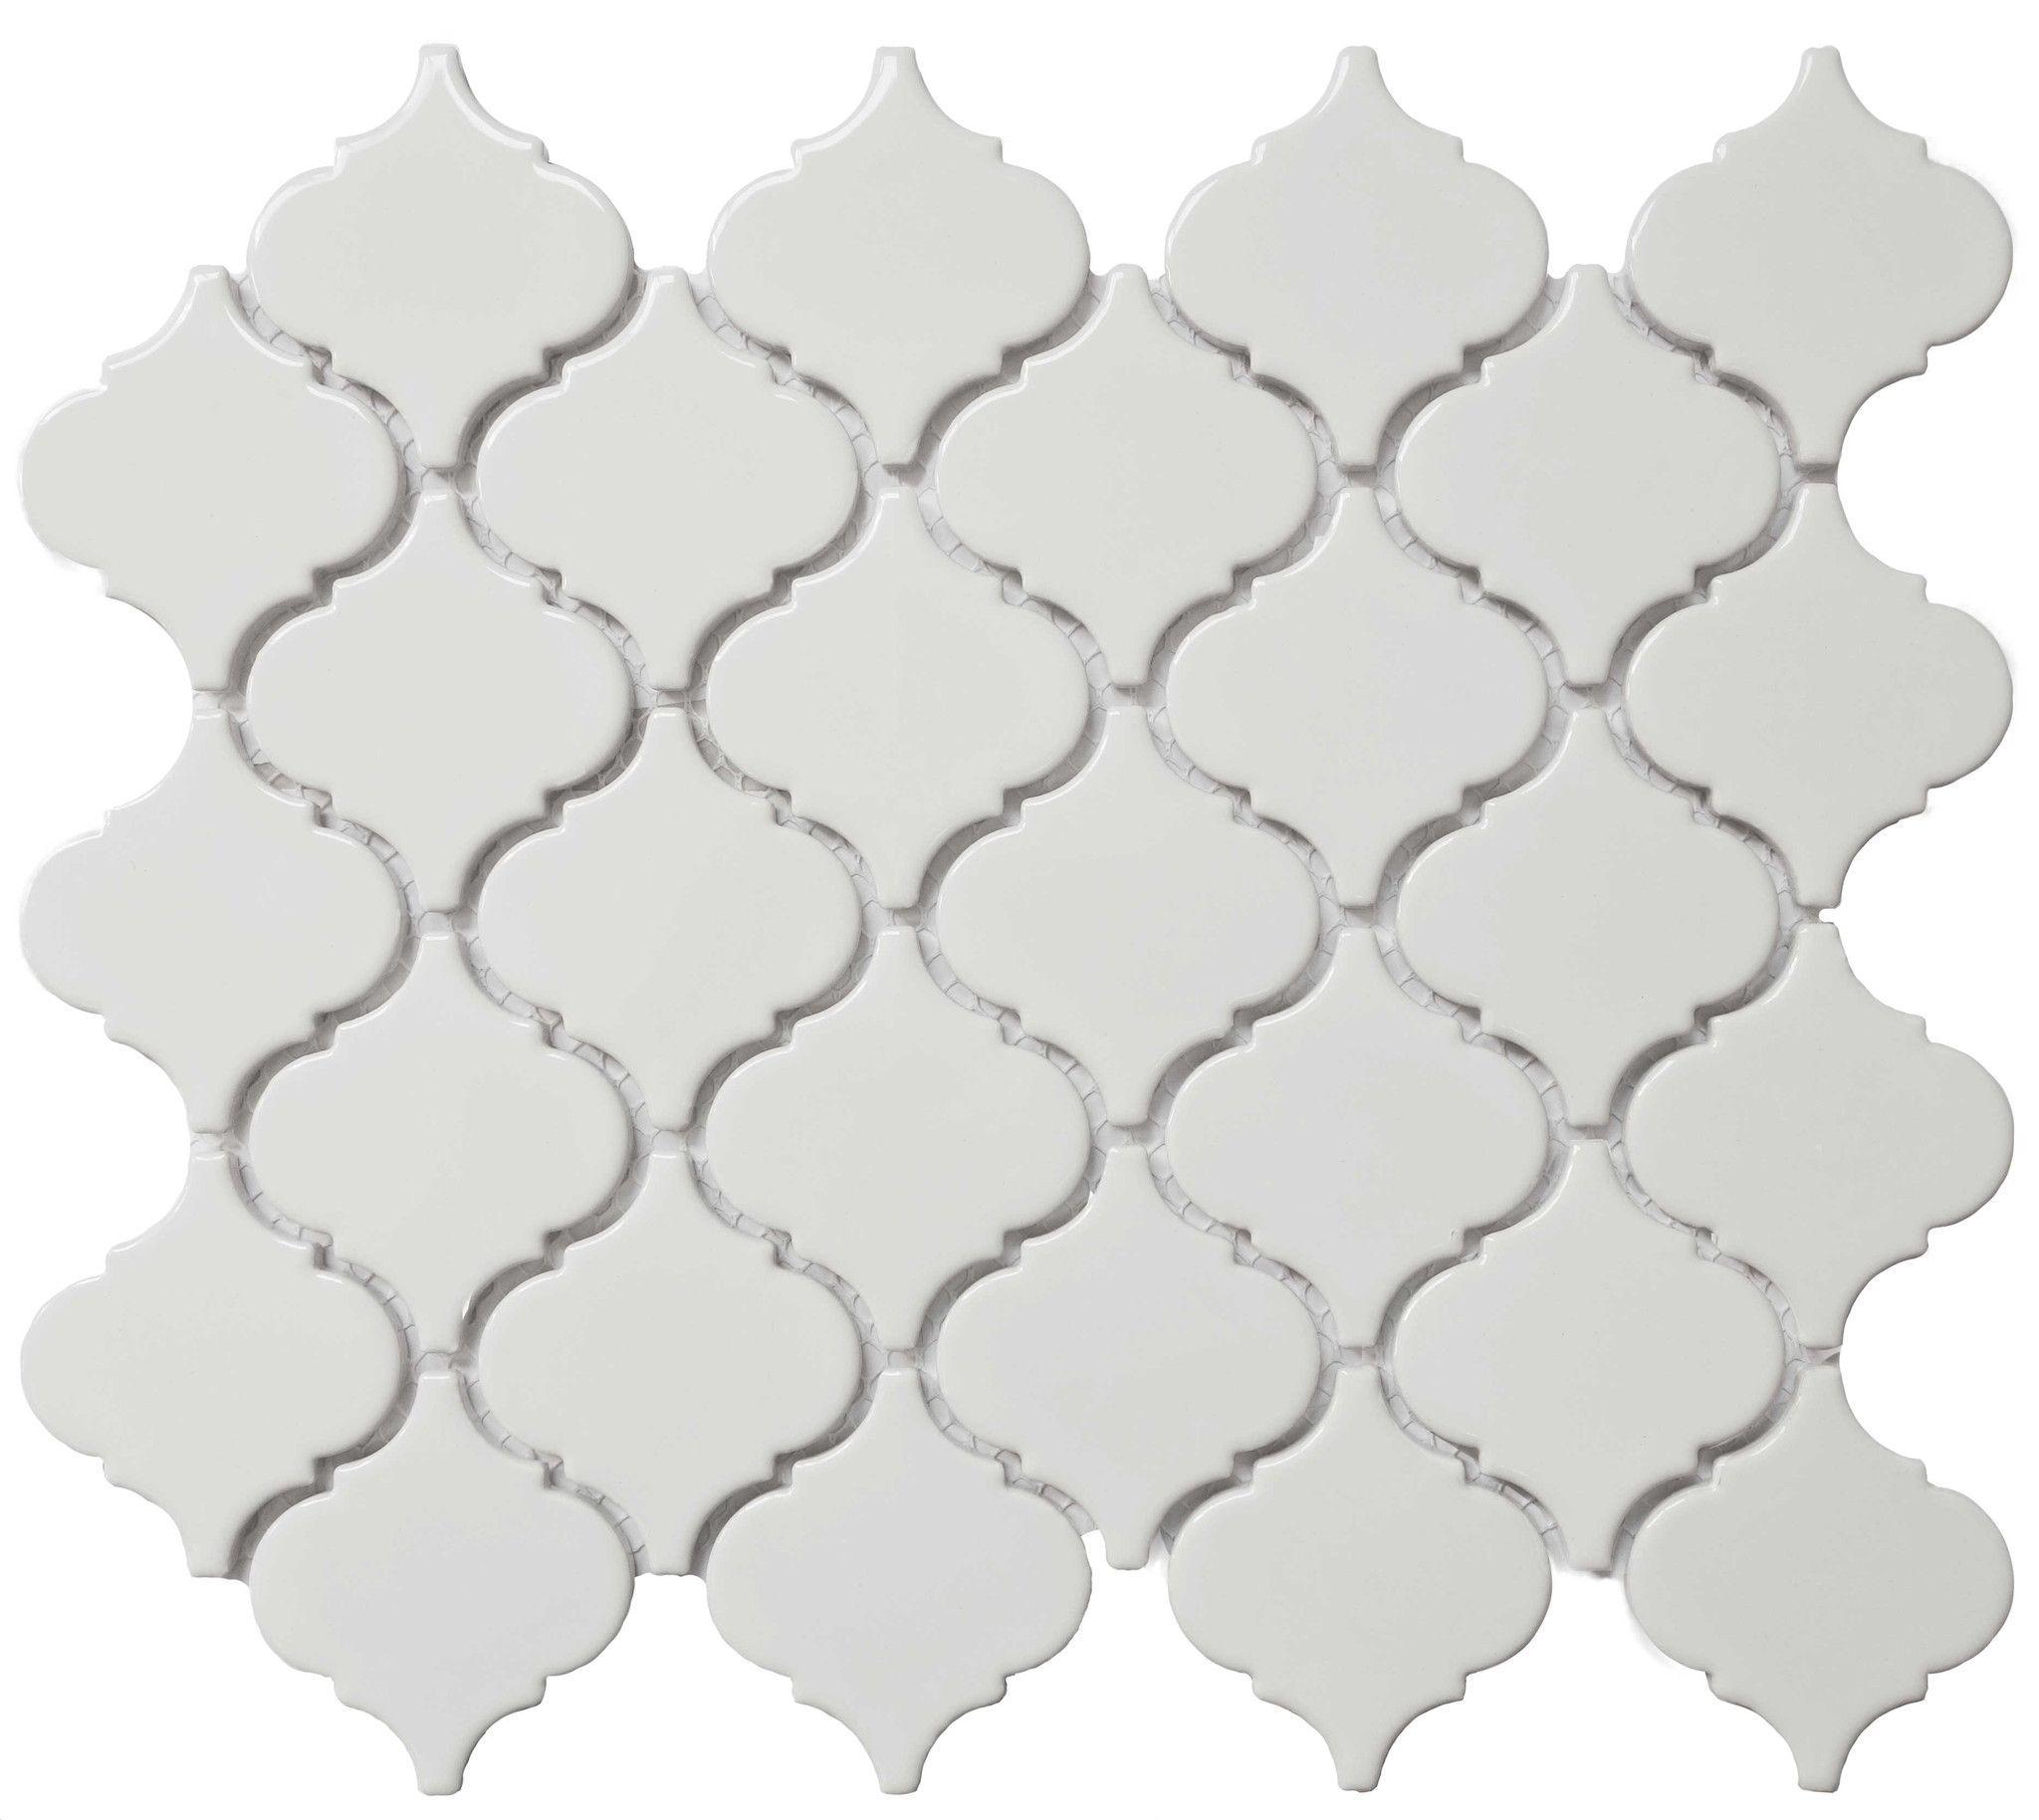 Royal White Glossy Arabesque Lantern Mosaic With Images White